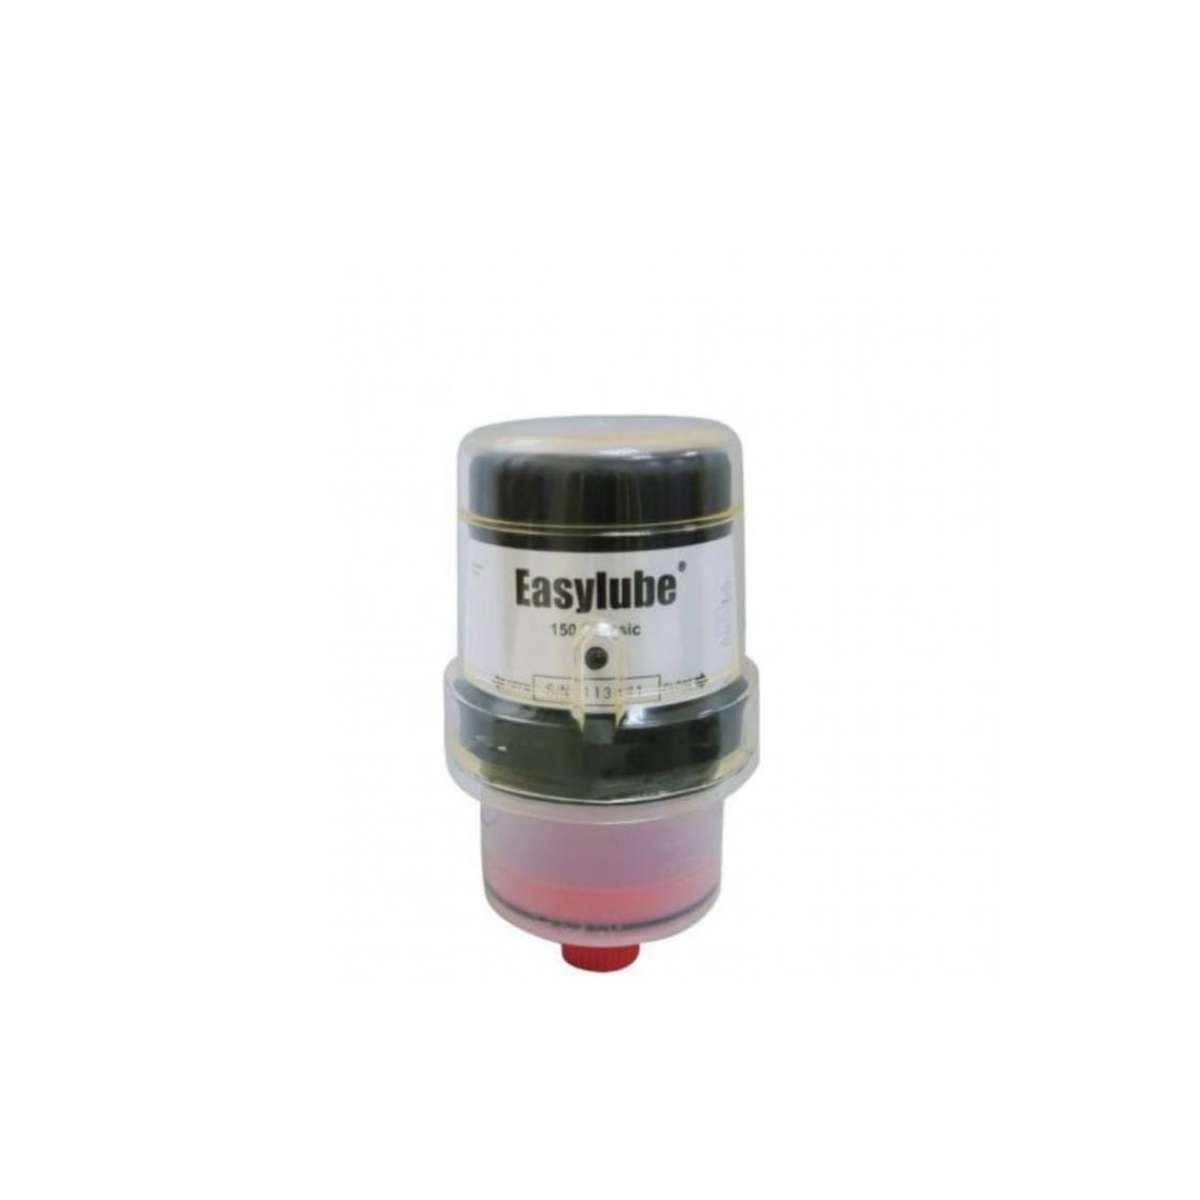 Easylube Lubricator 170 Classic Drive Unit & Protective Cover (150 ml Unit)